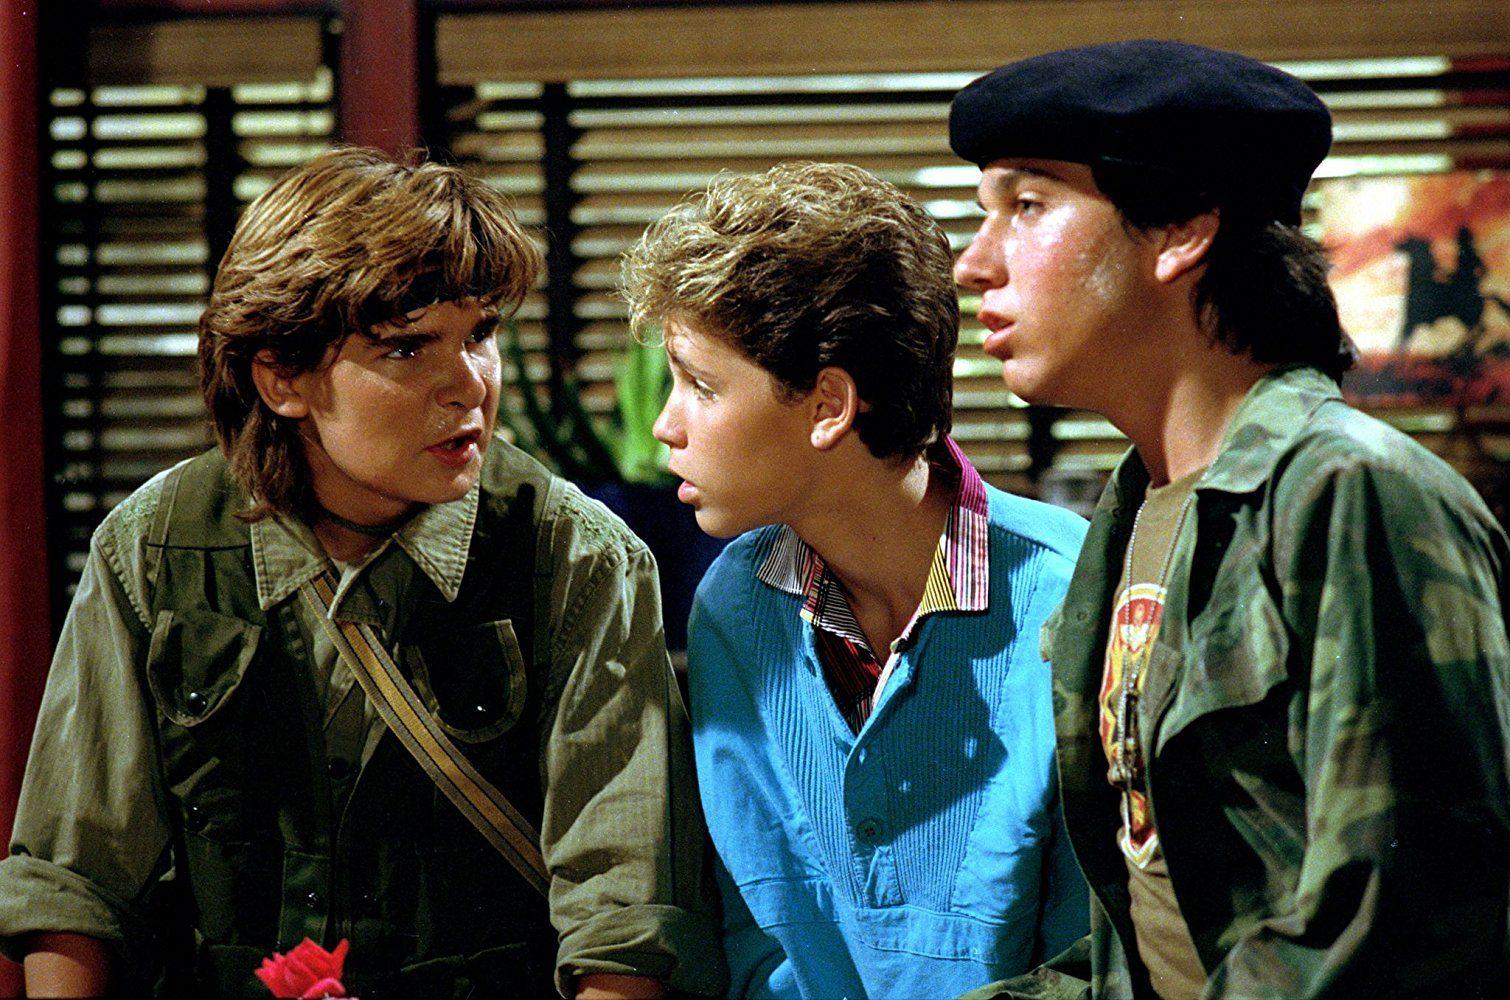 Corey Feldman, Corey Haim, and Jamison Newlander in The Lost Boys